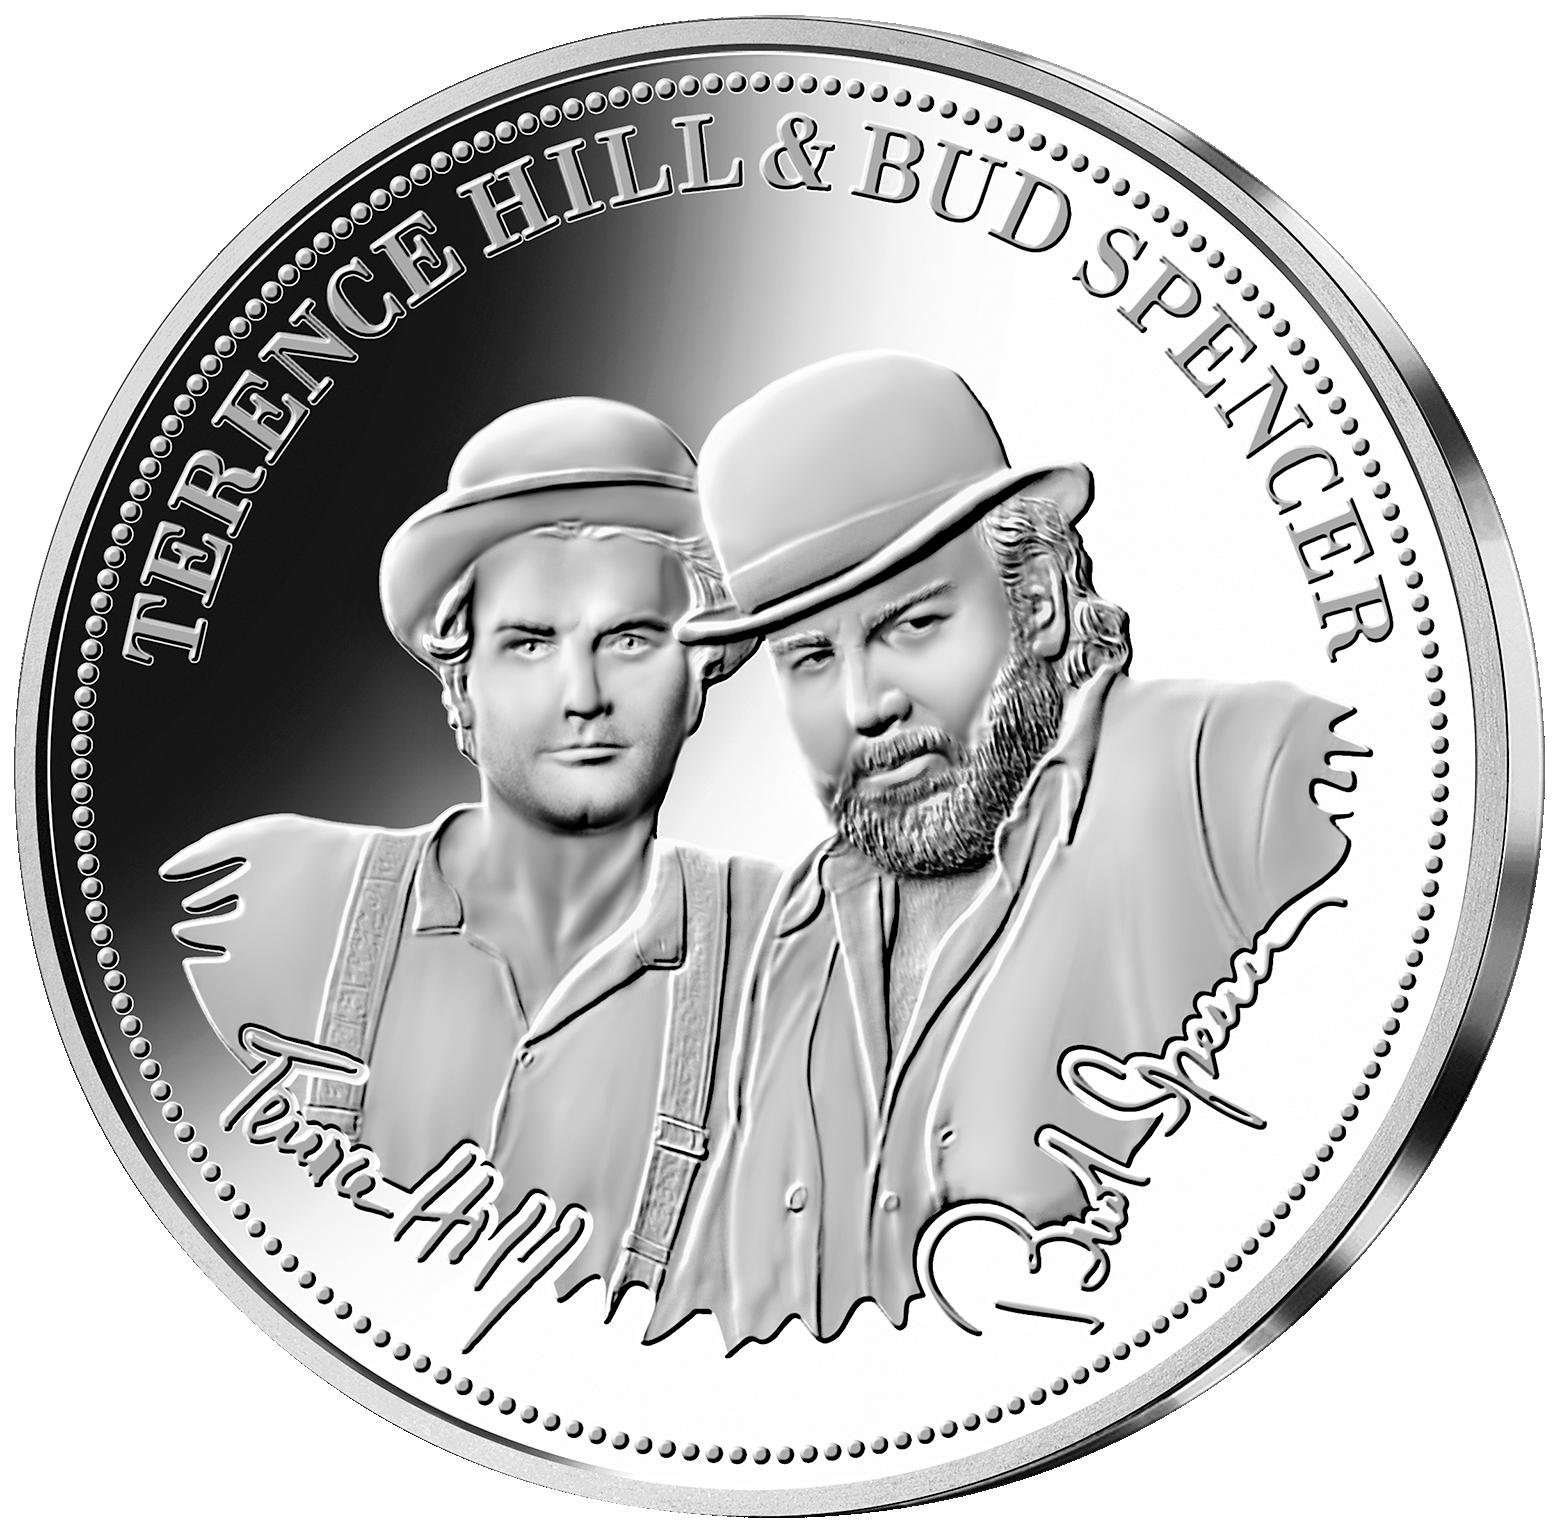 Jubiläumsausgabe 60 Jahre Terence Hill Bud Spencer 2019